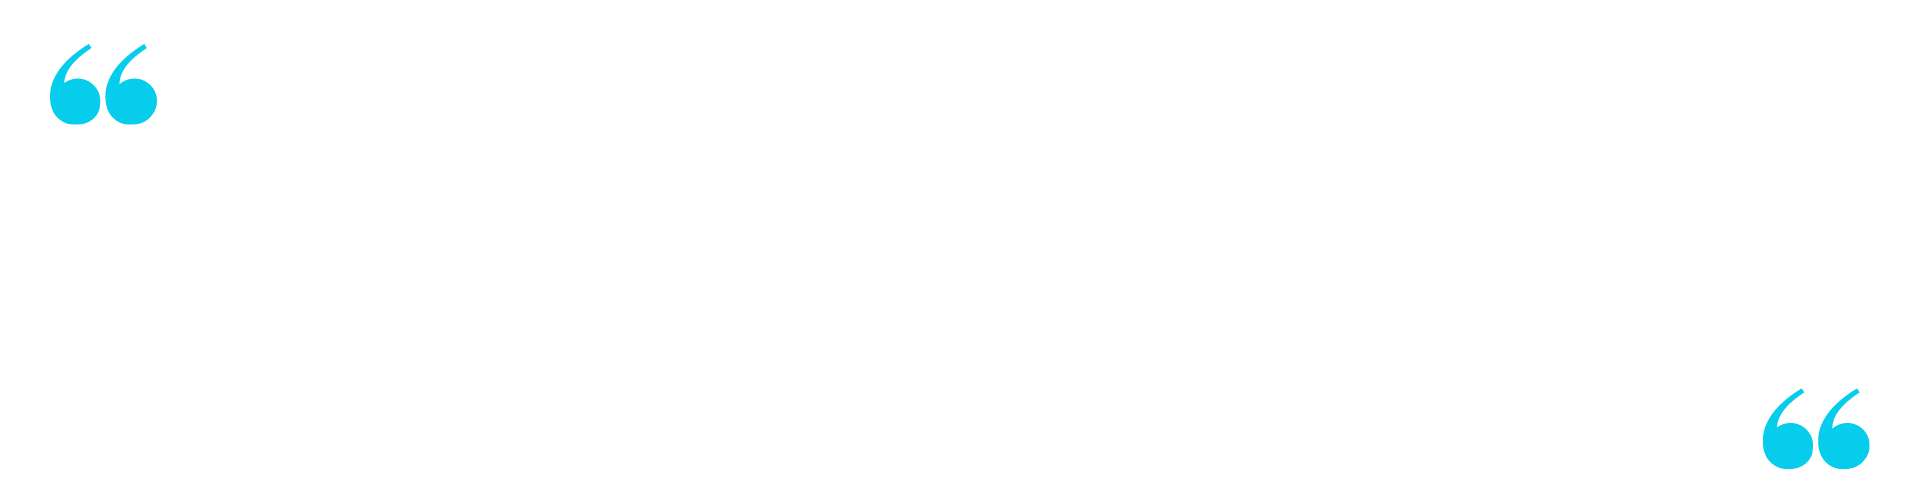 Copy of Freedom 2